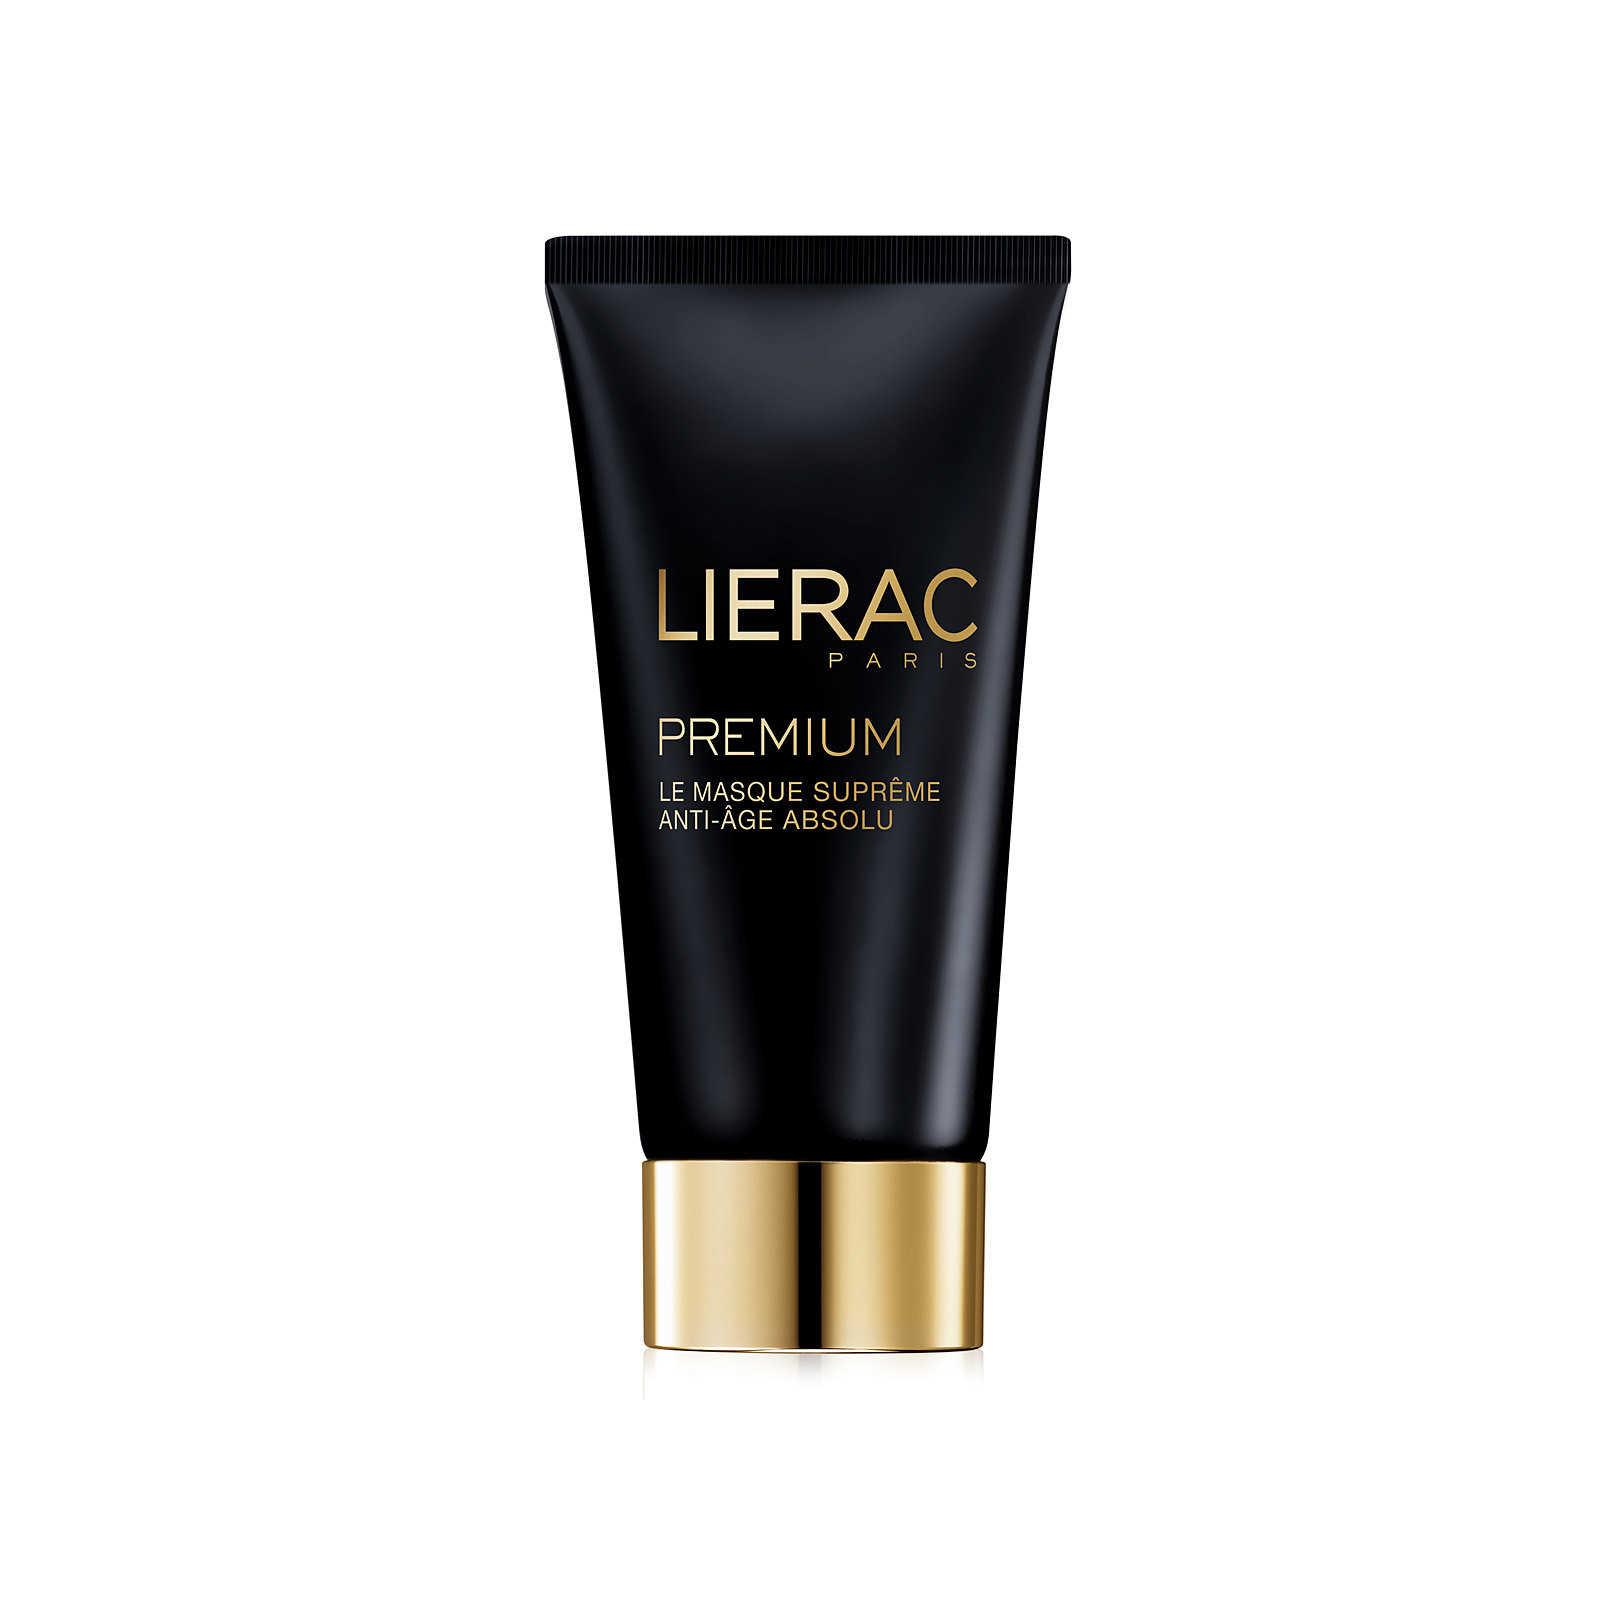 Lierac - Maschera viso antirughe Supreme - Antietà Globale - Premium